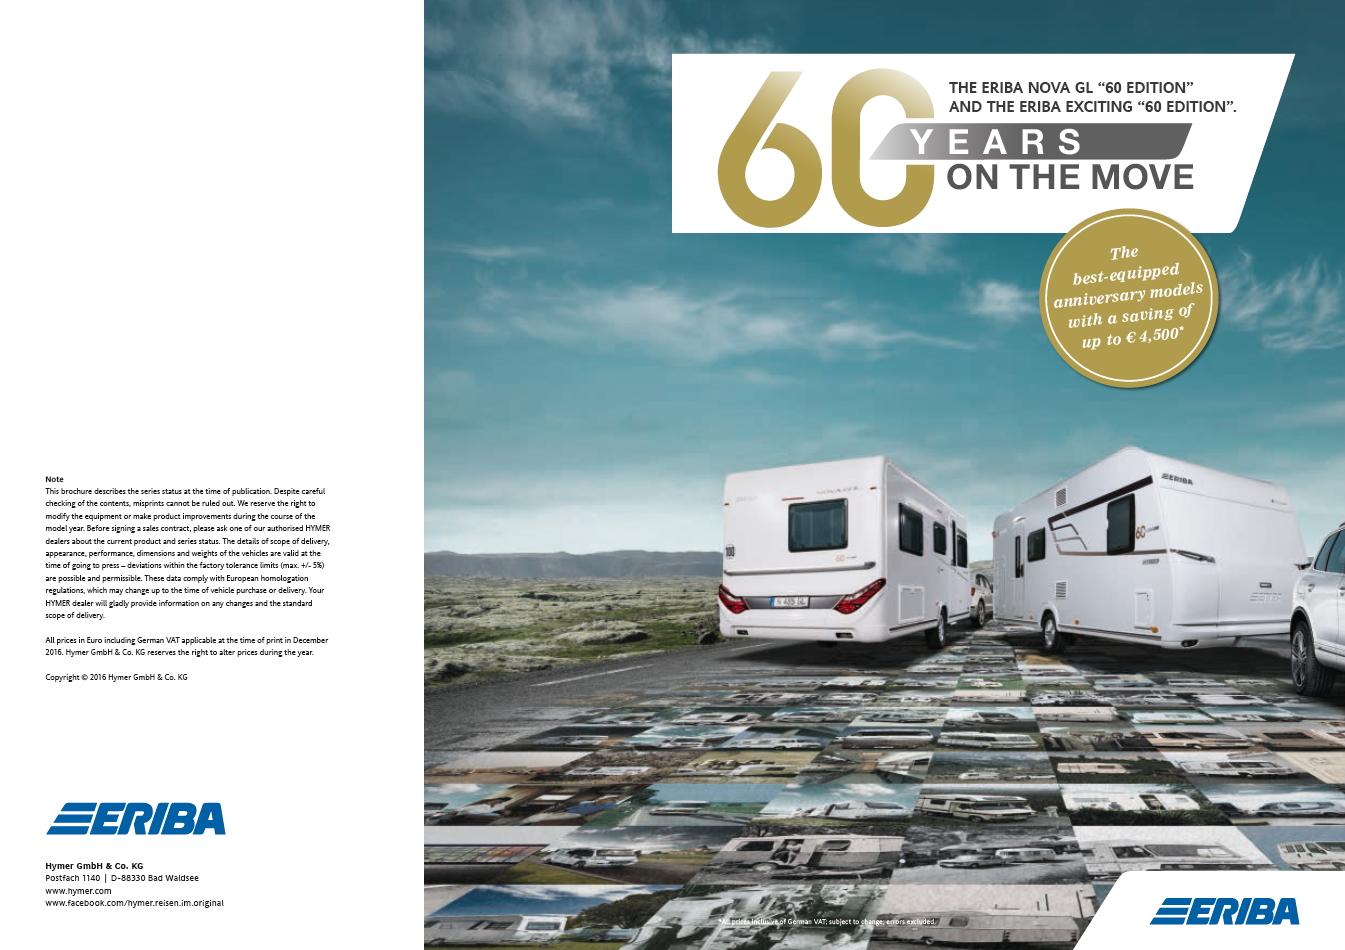 Eriba nova GL 60 Edition